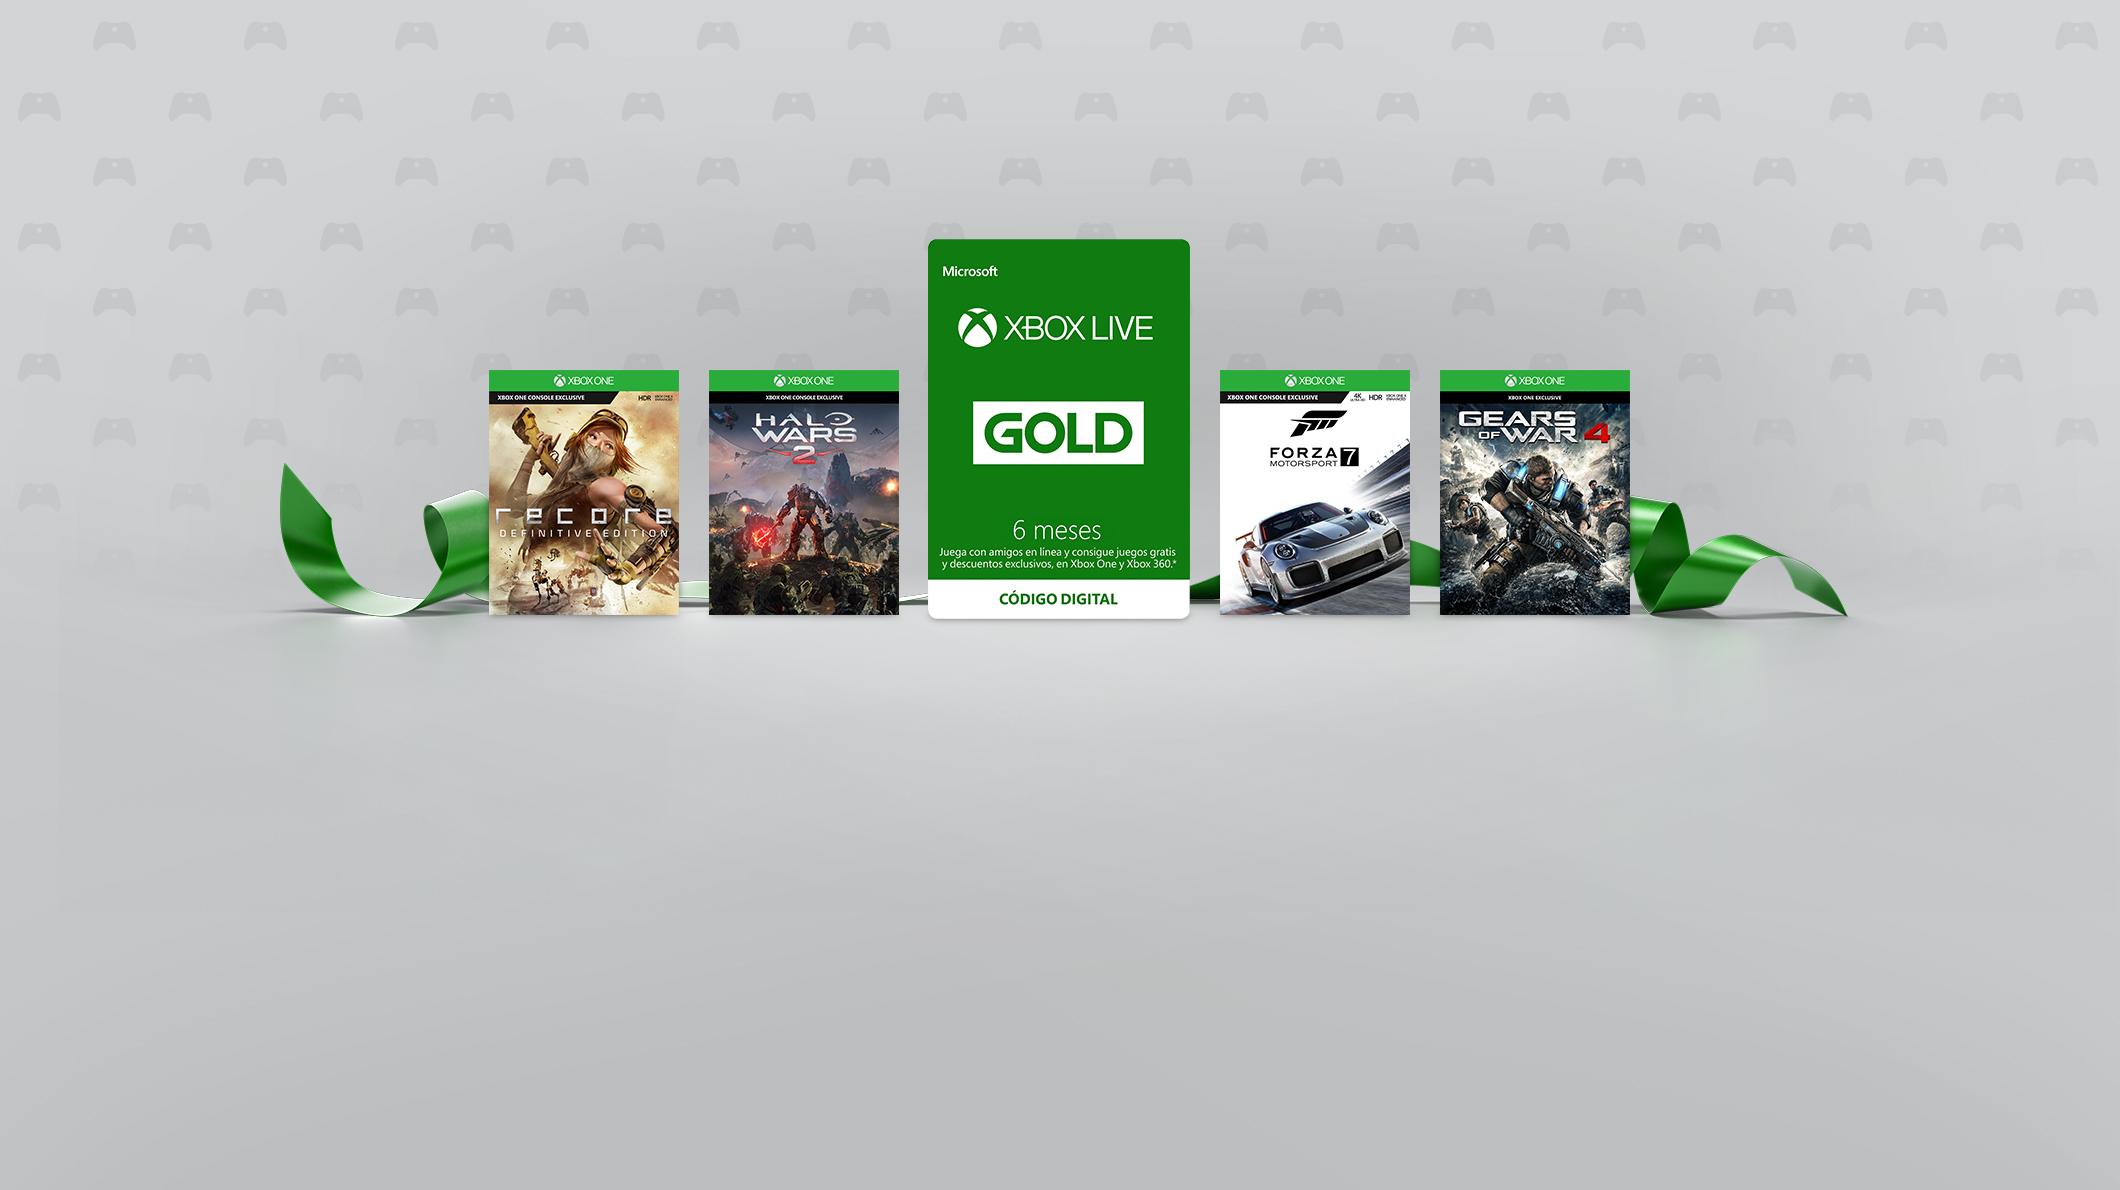 Xbox Live Gold de 3 meses y 6 meses